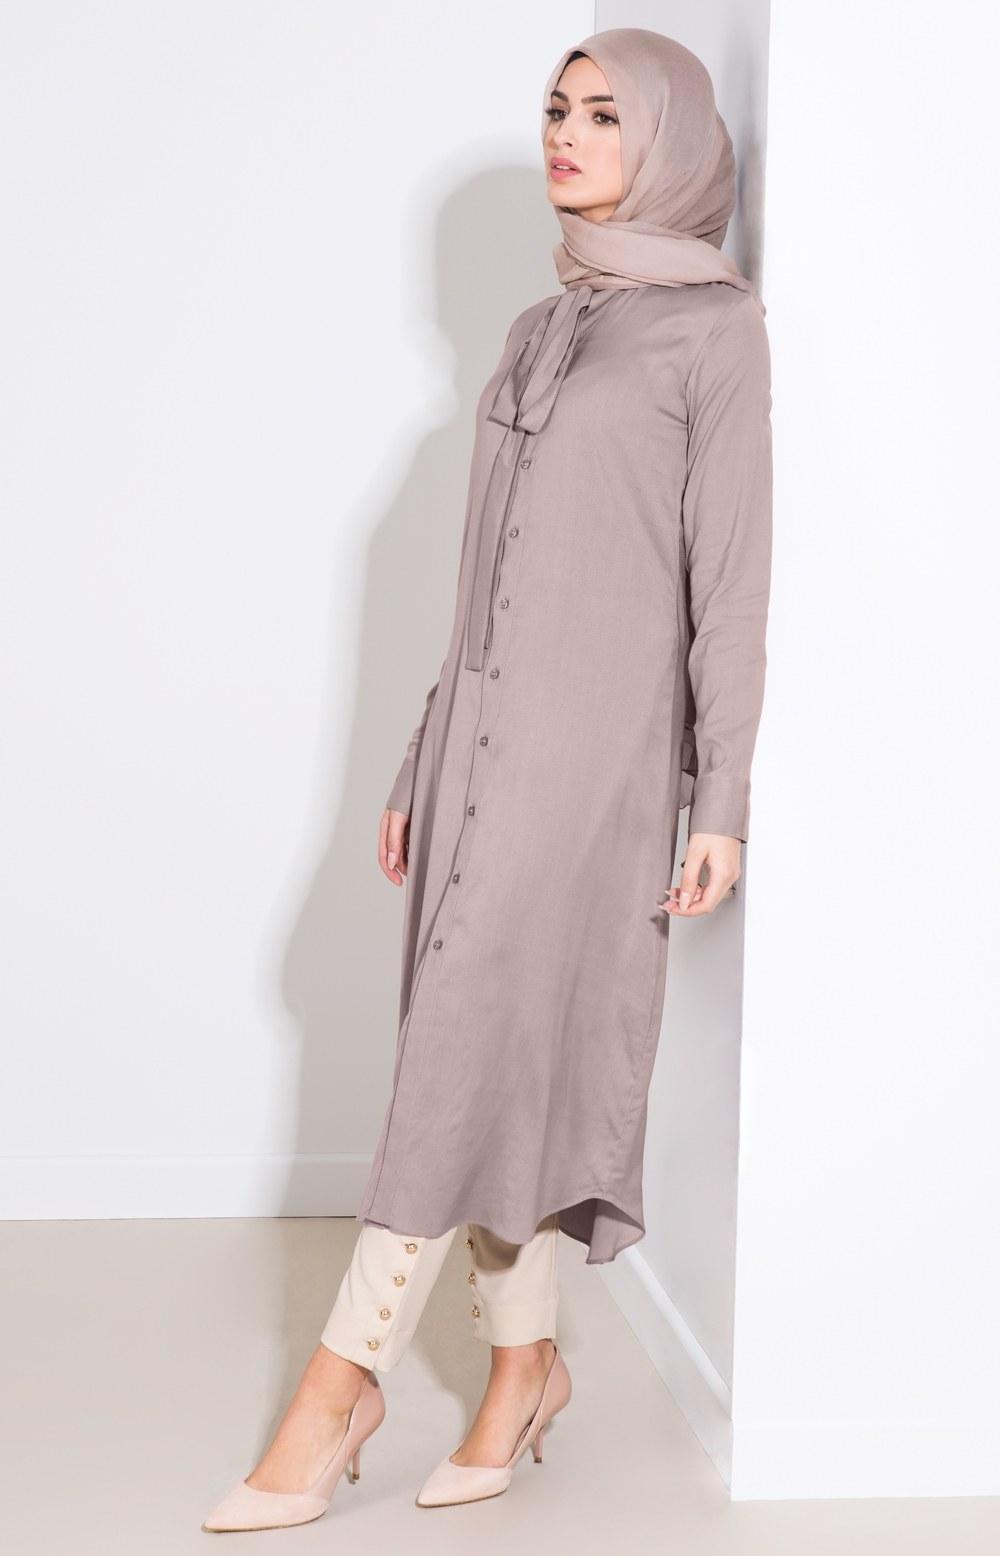 Inspirasi Model Baju Lebaran Syahrini 2017 U3dh 25 Trend Model Baju Muslim Lebaran 2018 Simple & Modis